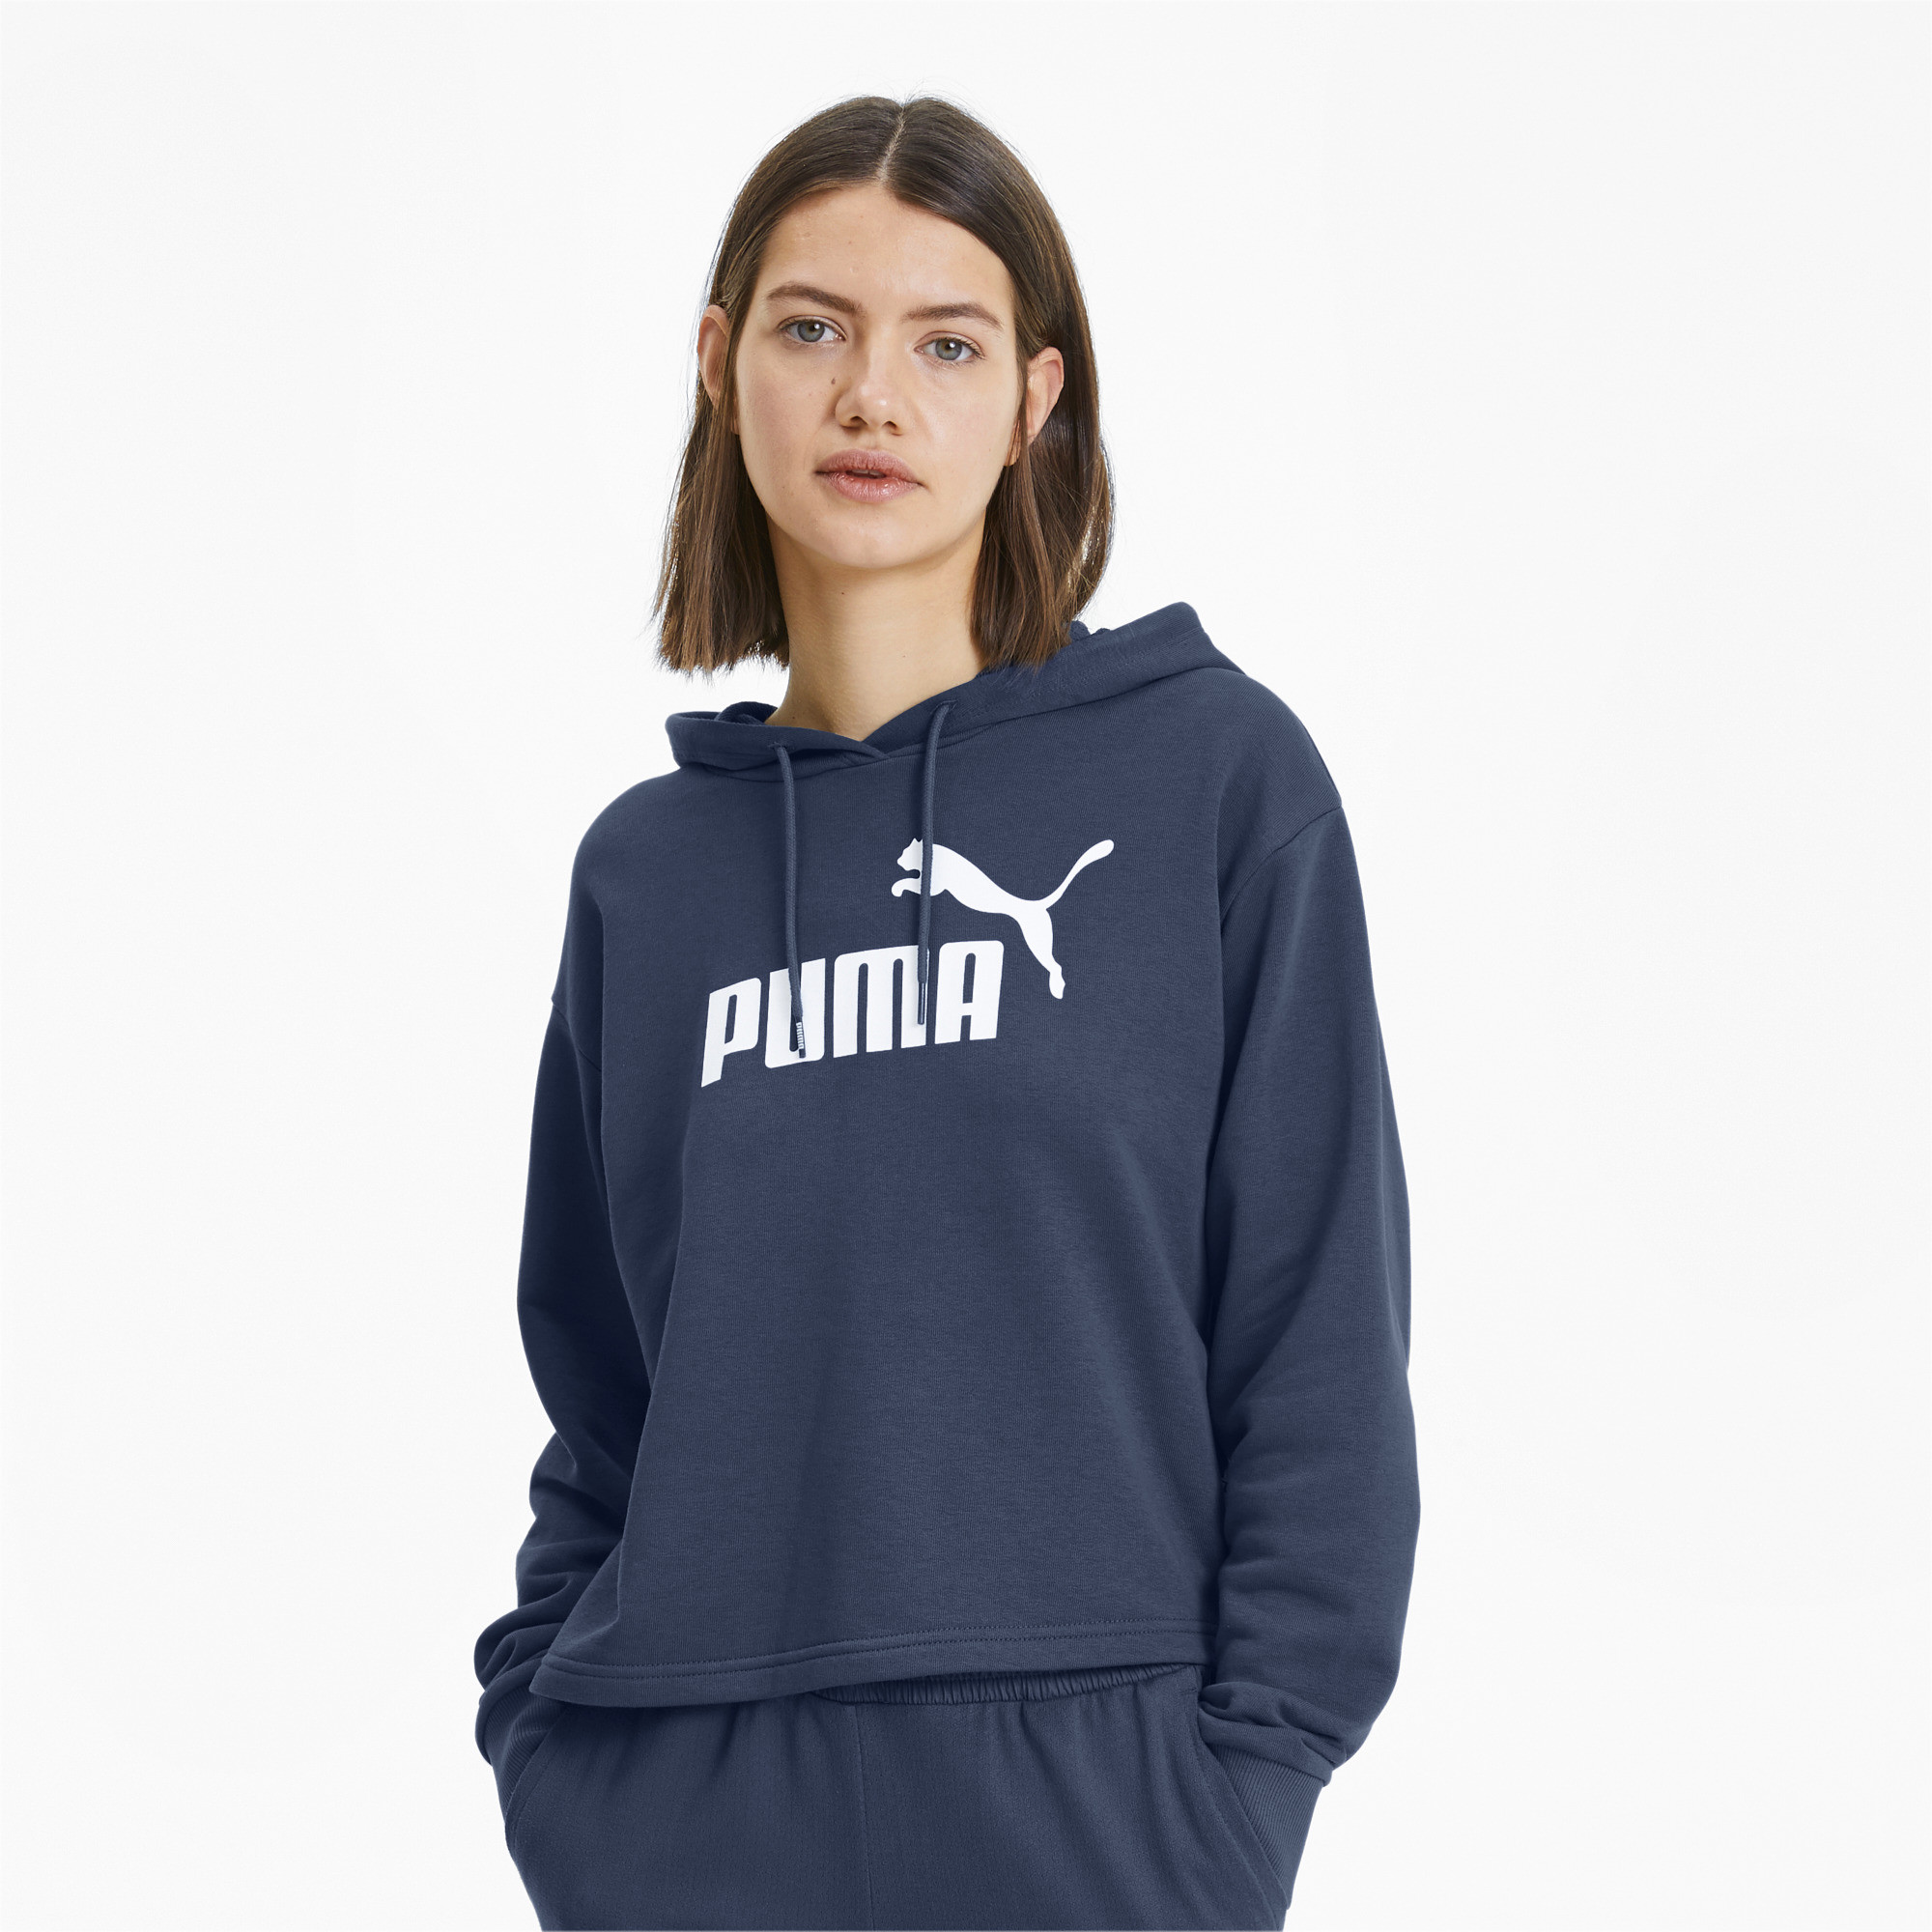 PUMA-Essentials-Women-039-s-Cropped-Hoodie-Women-Sweat-Basics thumbnail 13